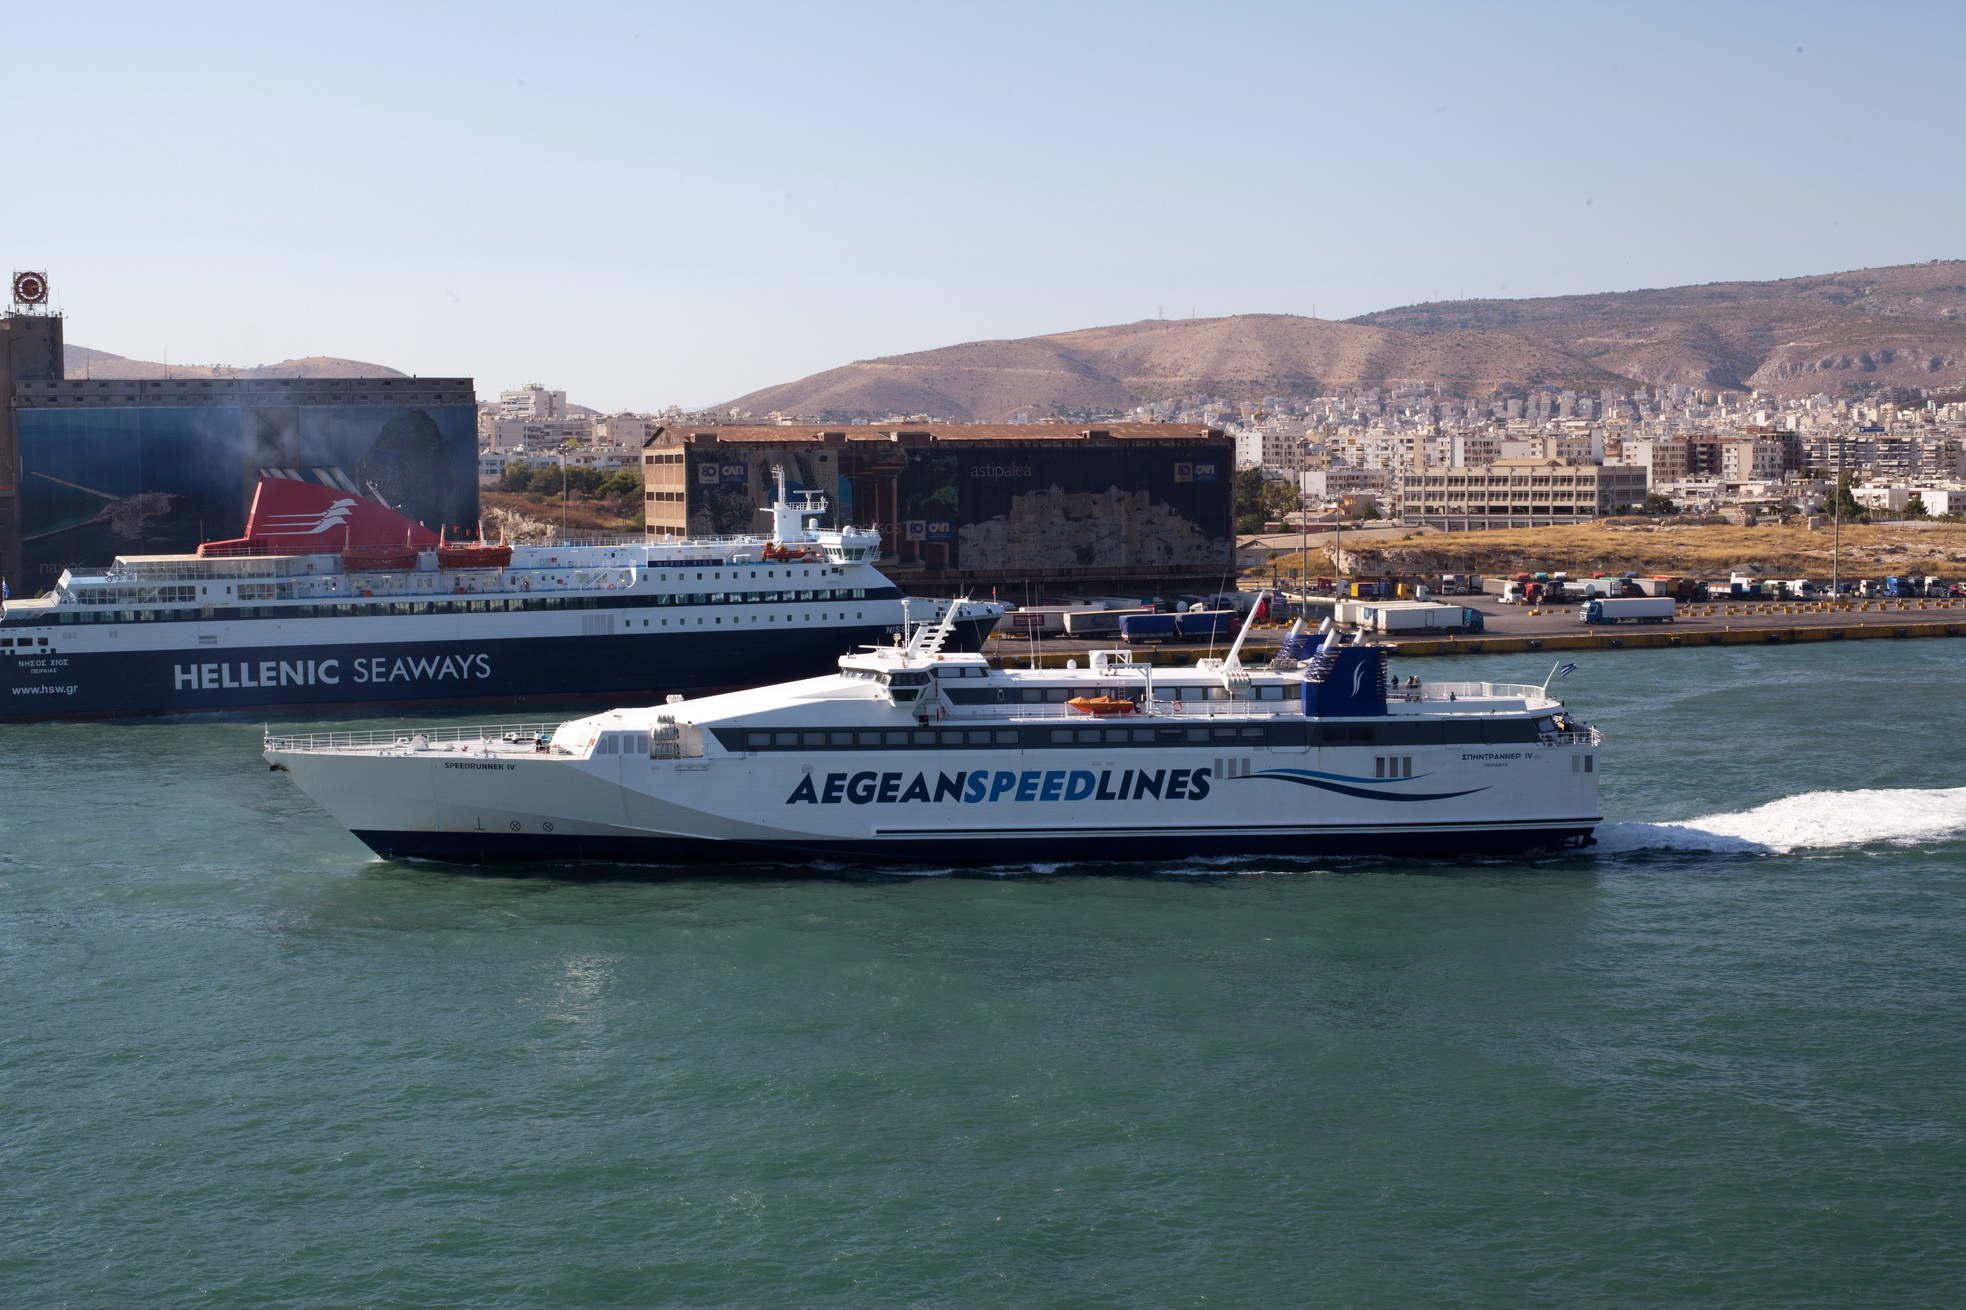 MS Speedrunner IV IMO 9141883 Aegean Speed Lines leaving Piraeus Port of Athens Greece 04